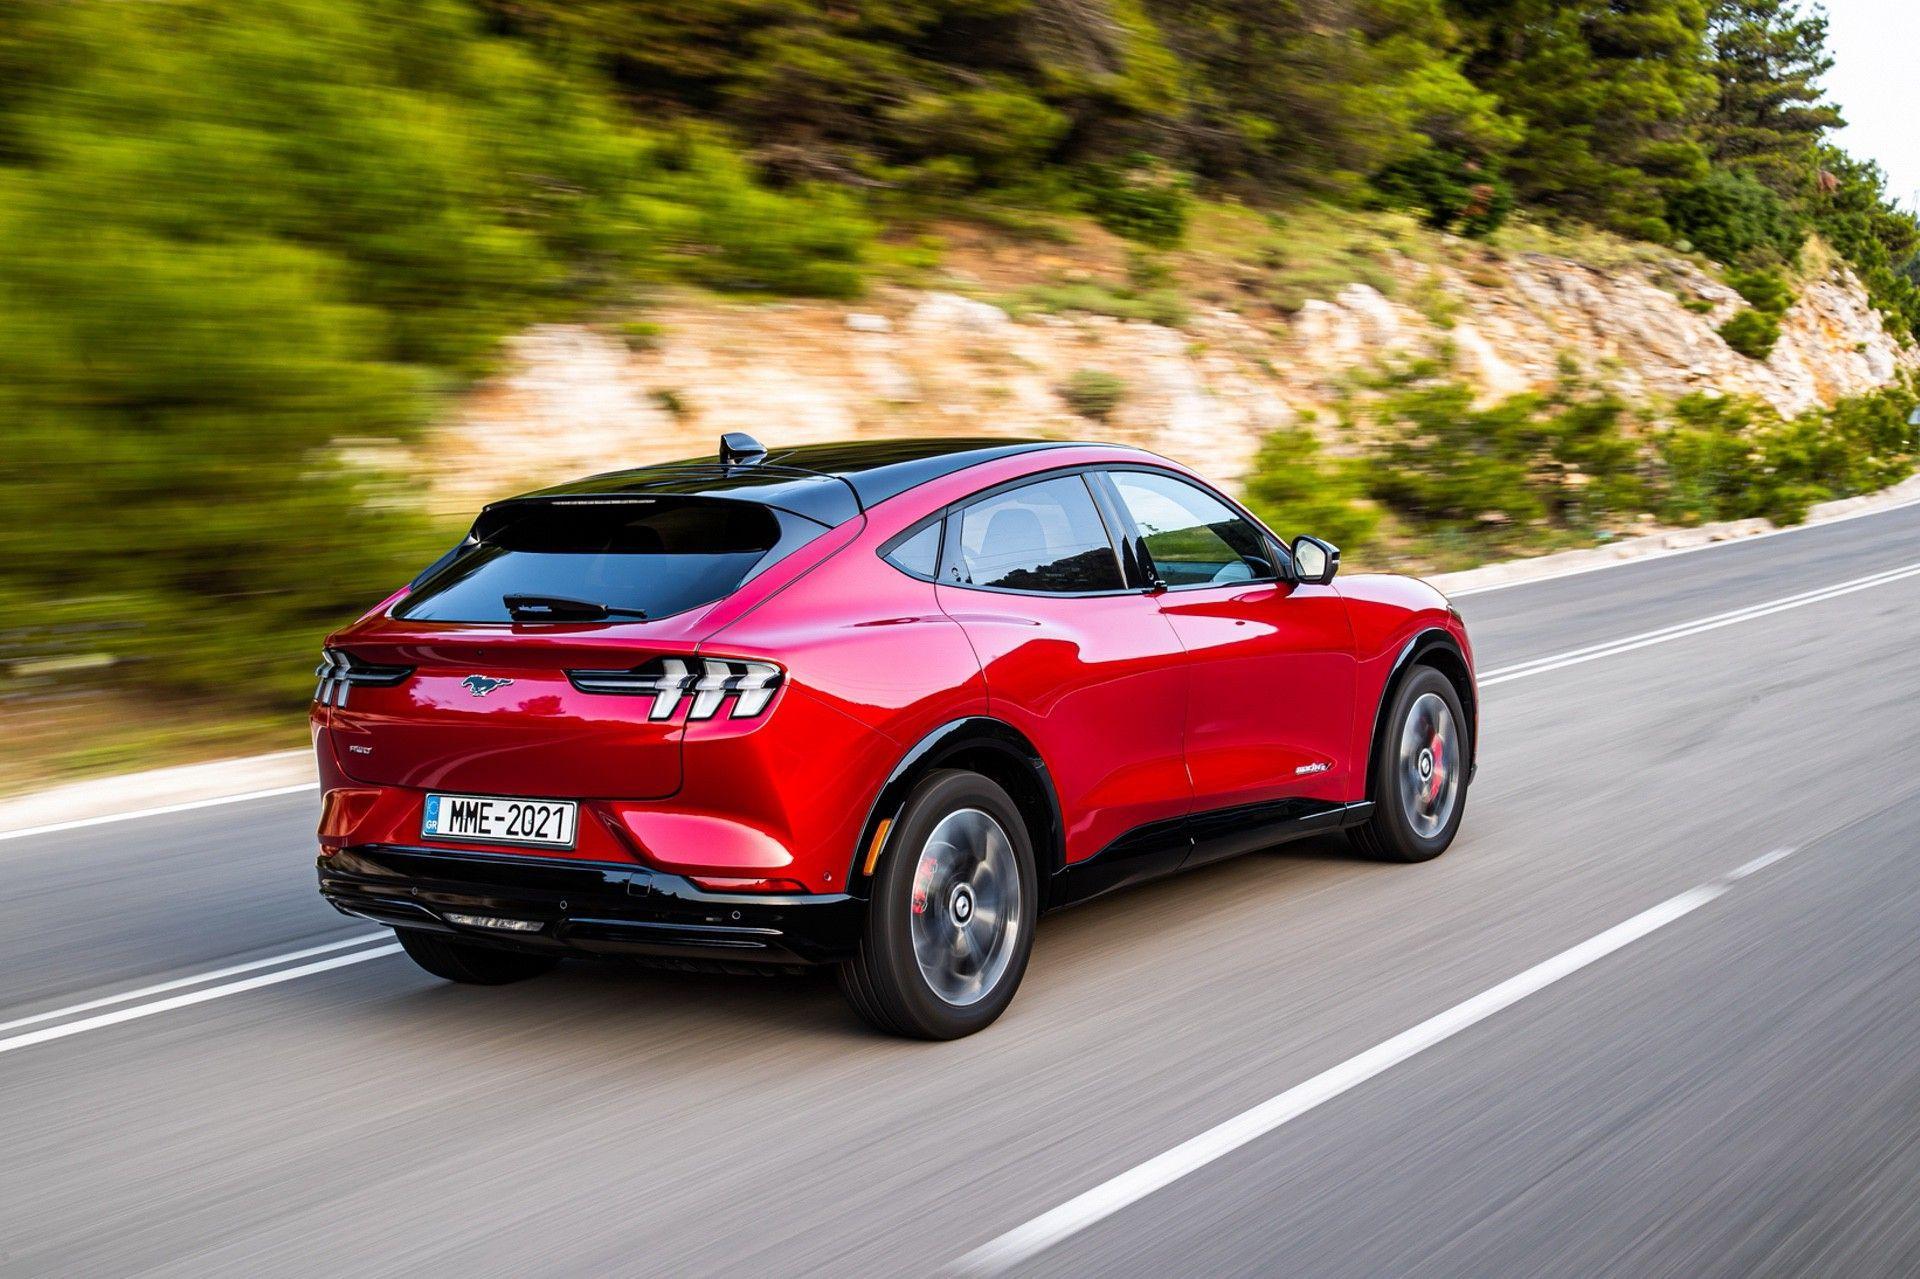 Ford_Mustang_Mach-E_greek_presskit-0120